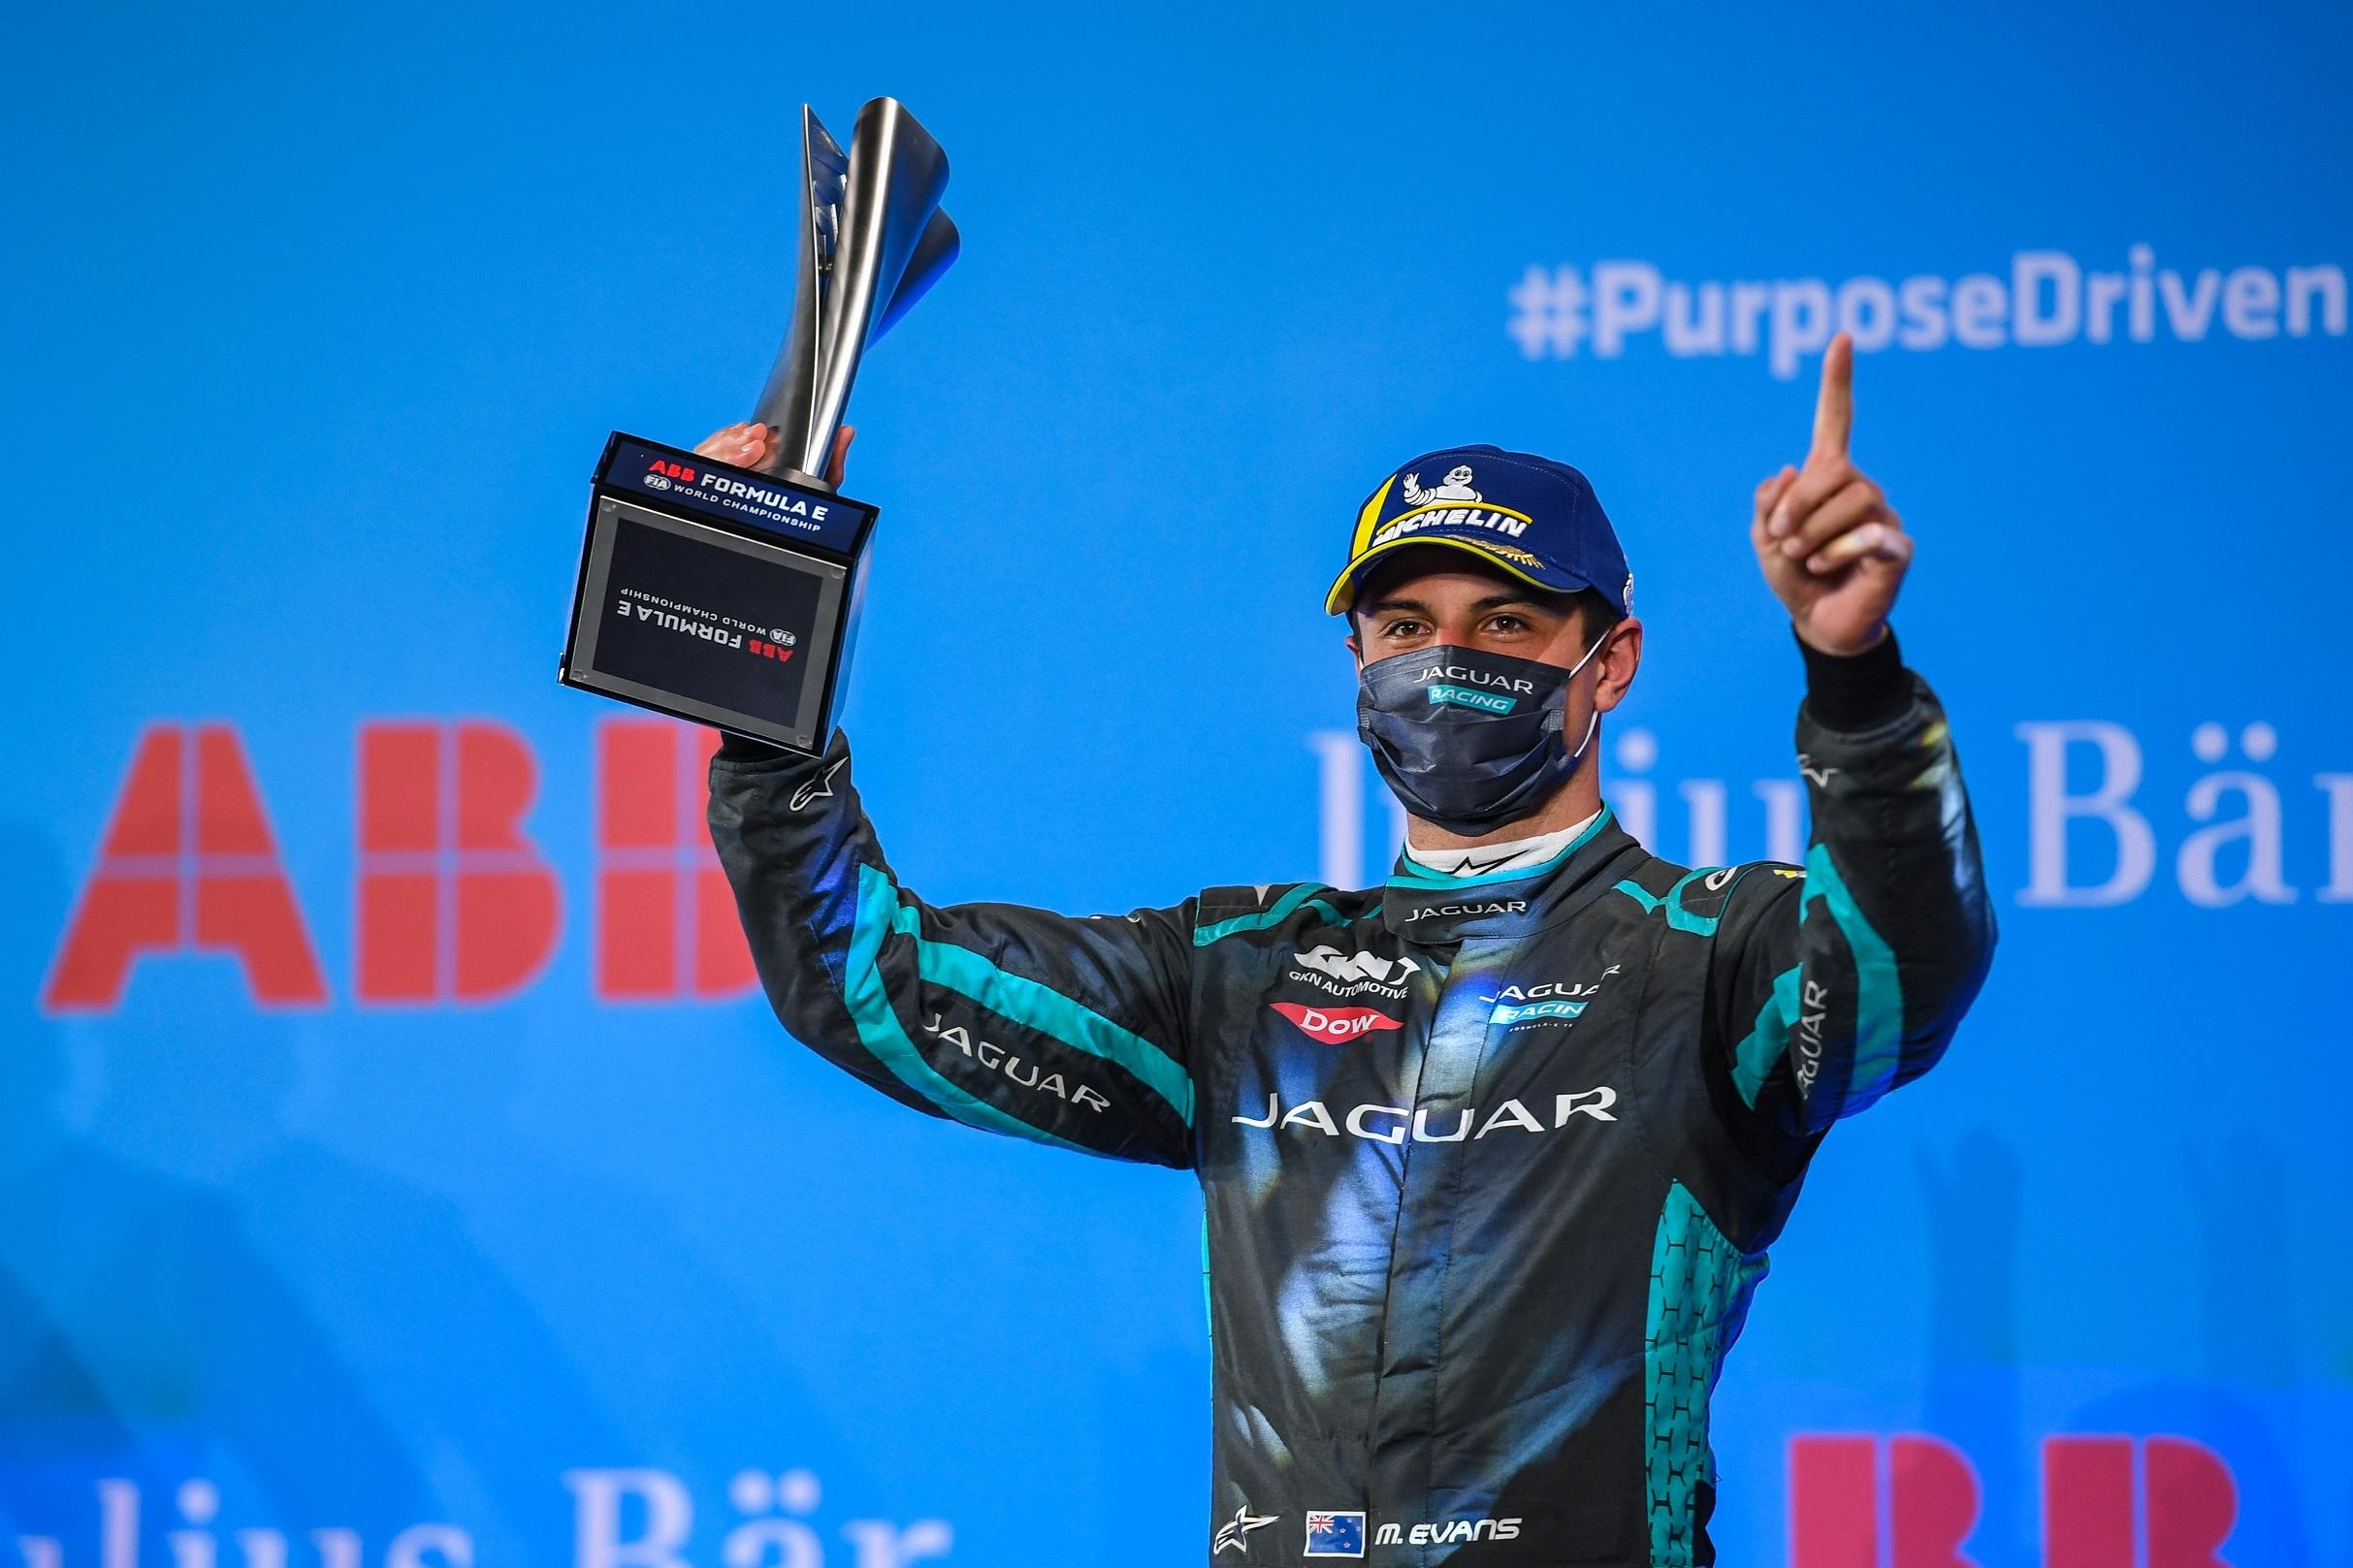 Podium finish for mitch evans & jaguar racing under the lights at the diriyah e-prix